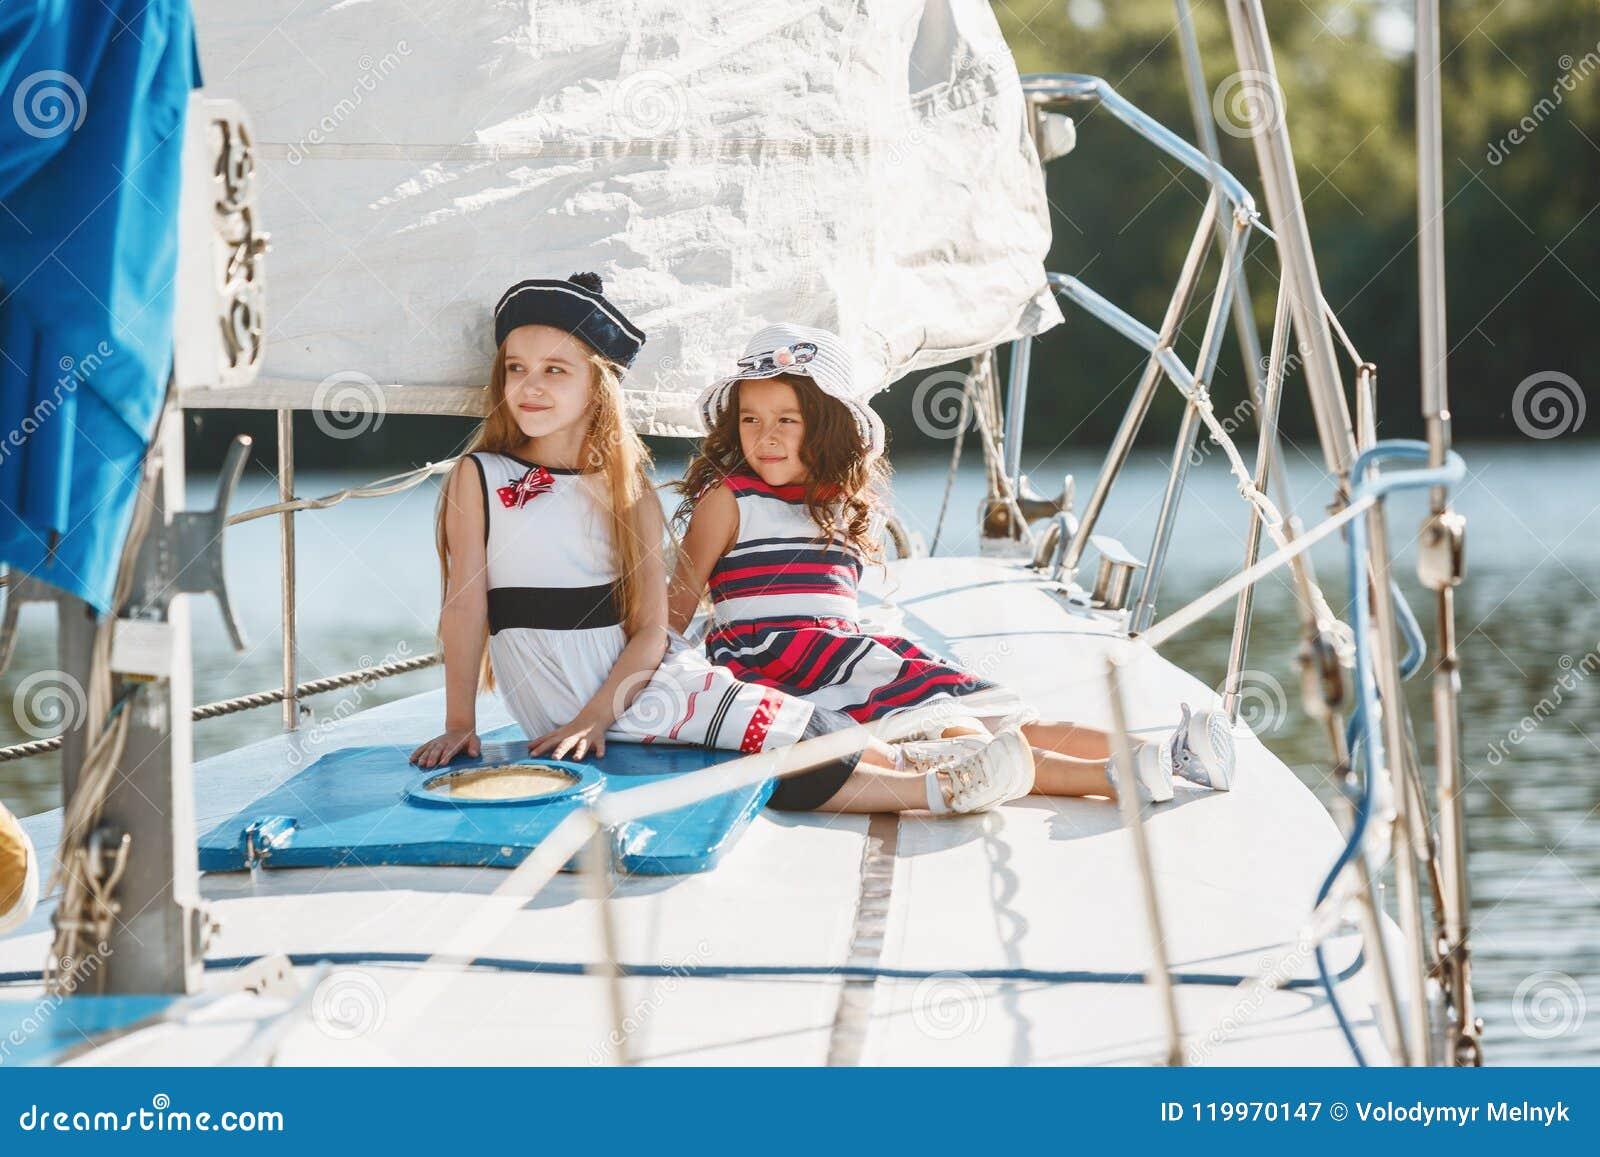 Seems remarkable teen girls sailing photos